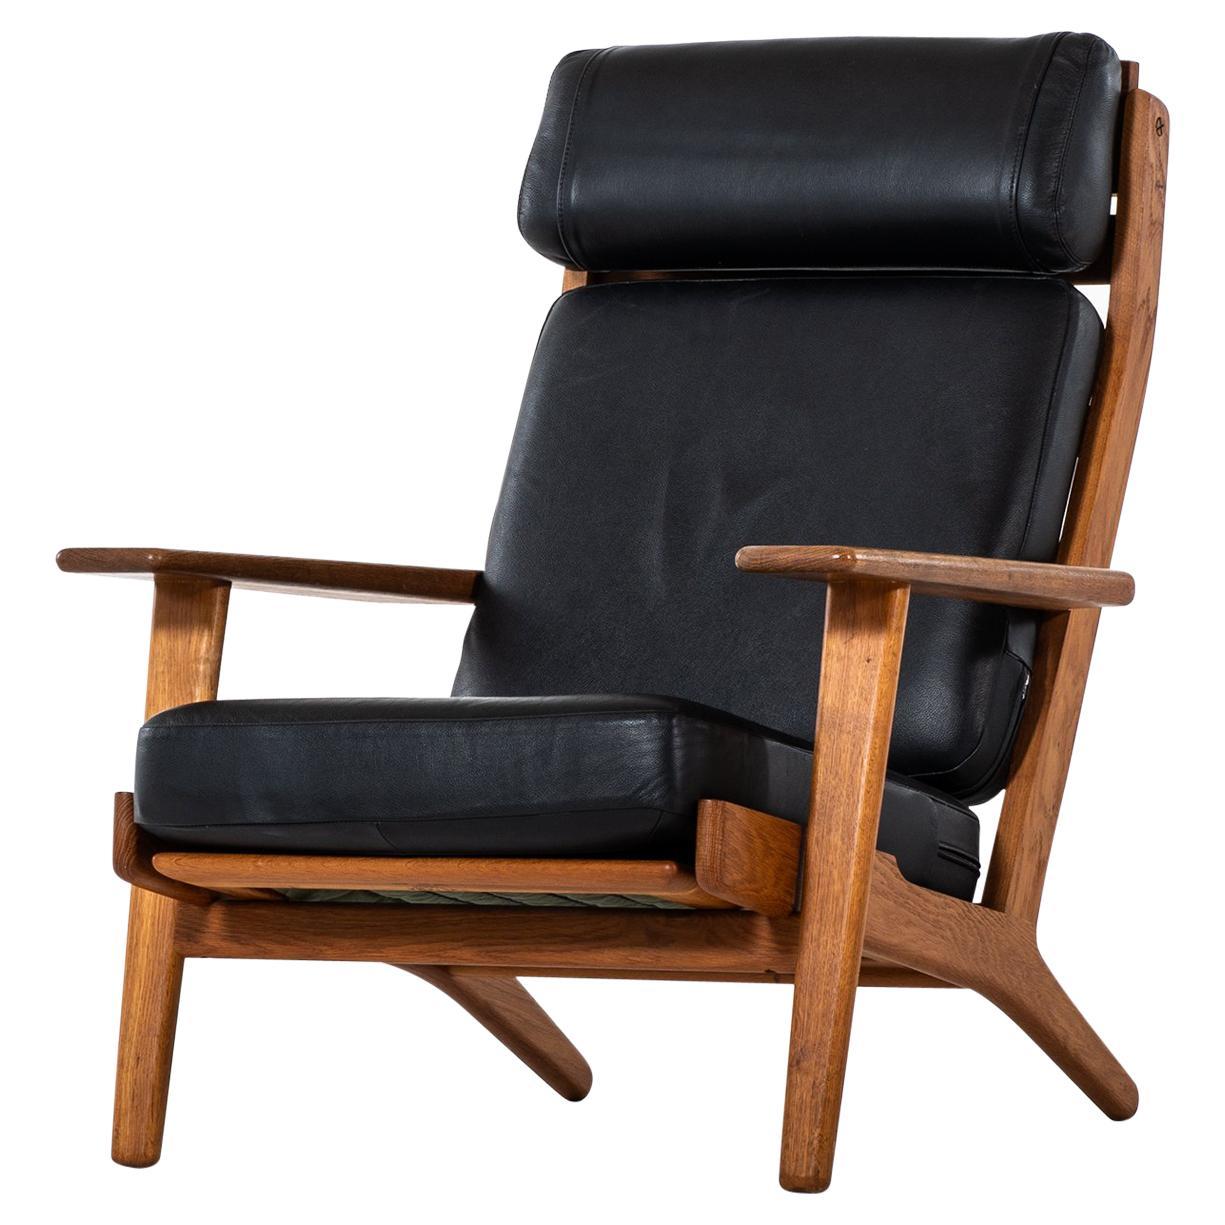 Hans Wegner Easy Chair Model GE-290 by GETAMA in Denmark